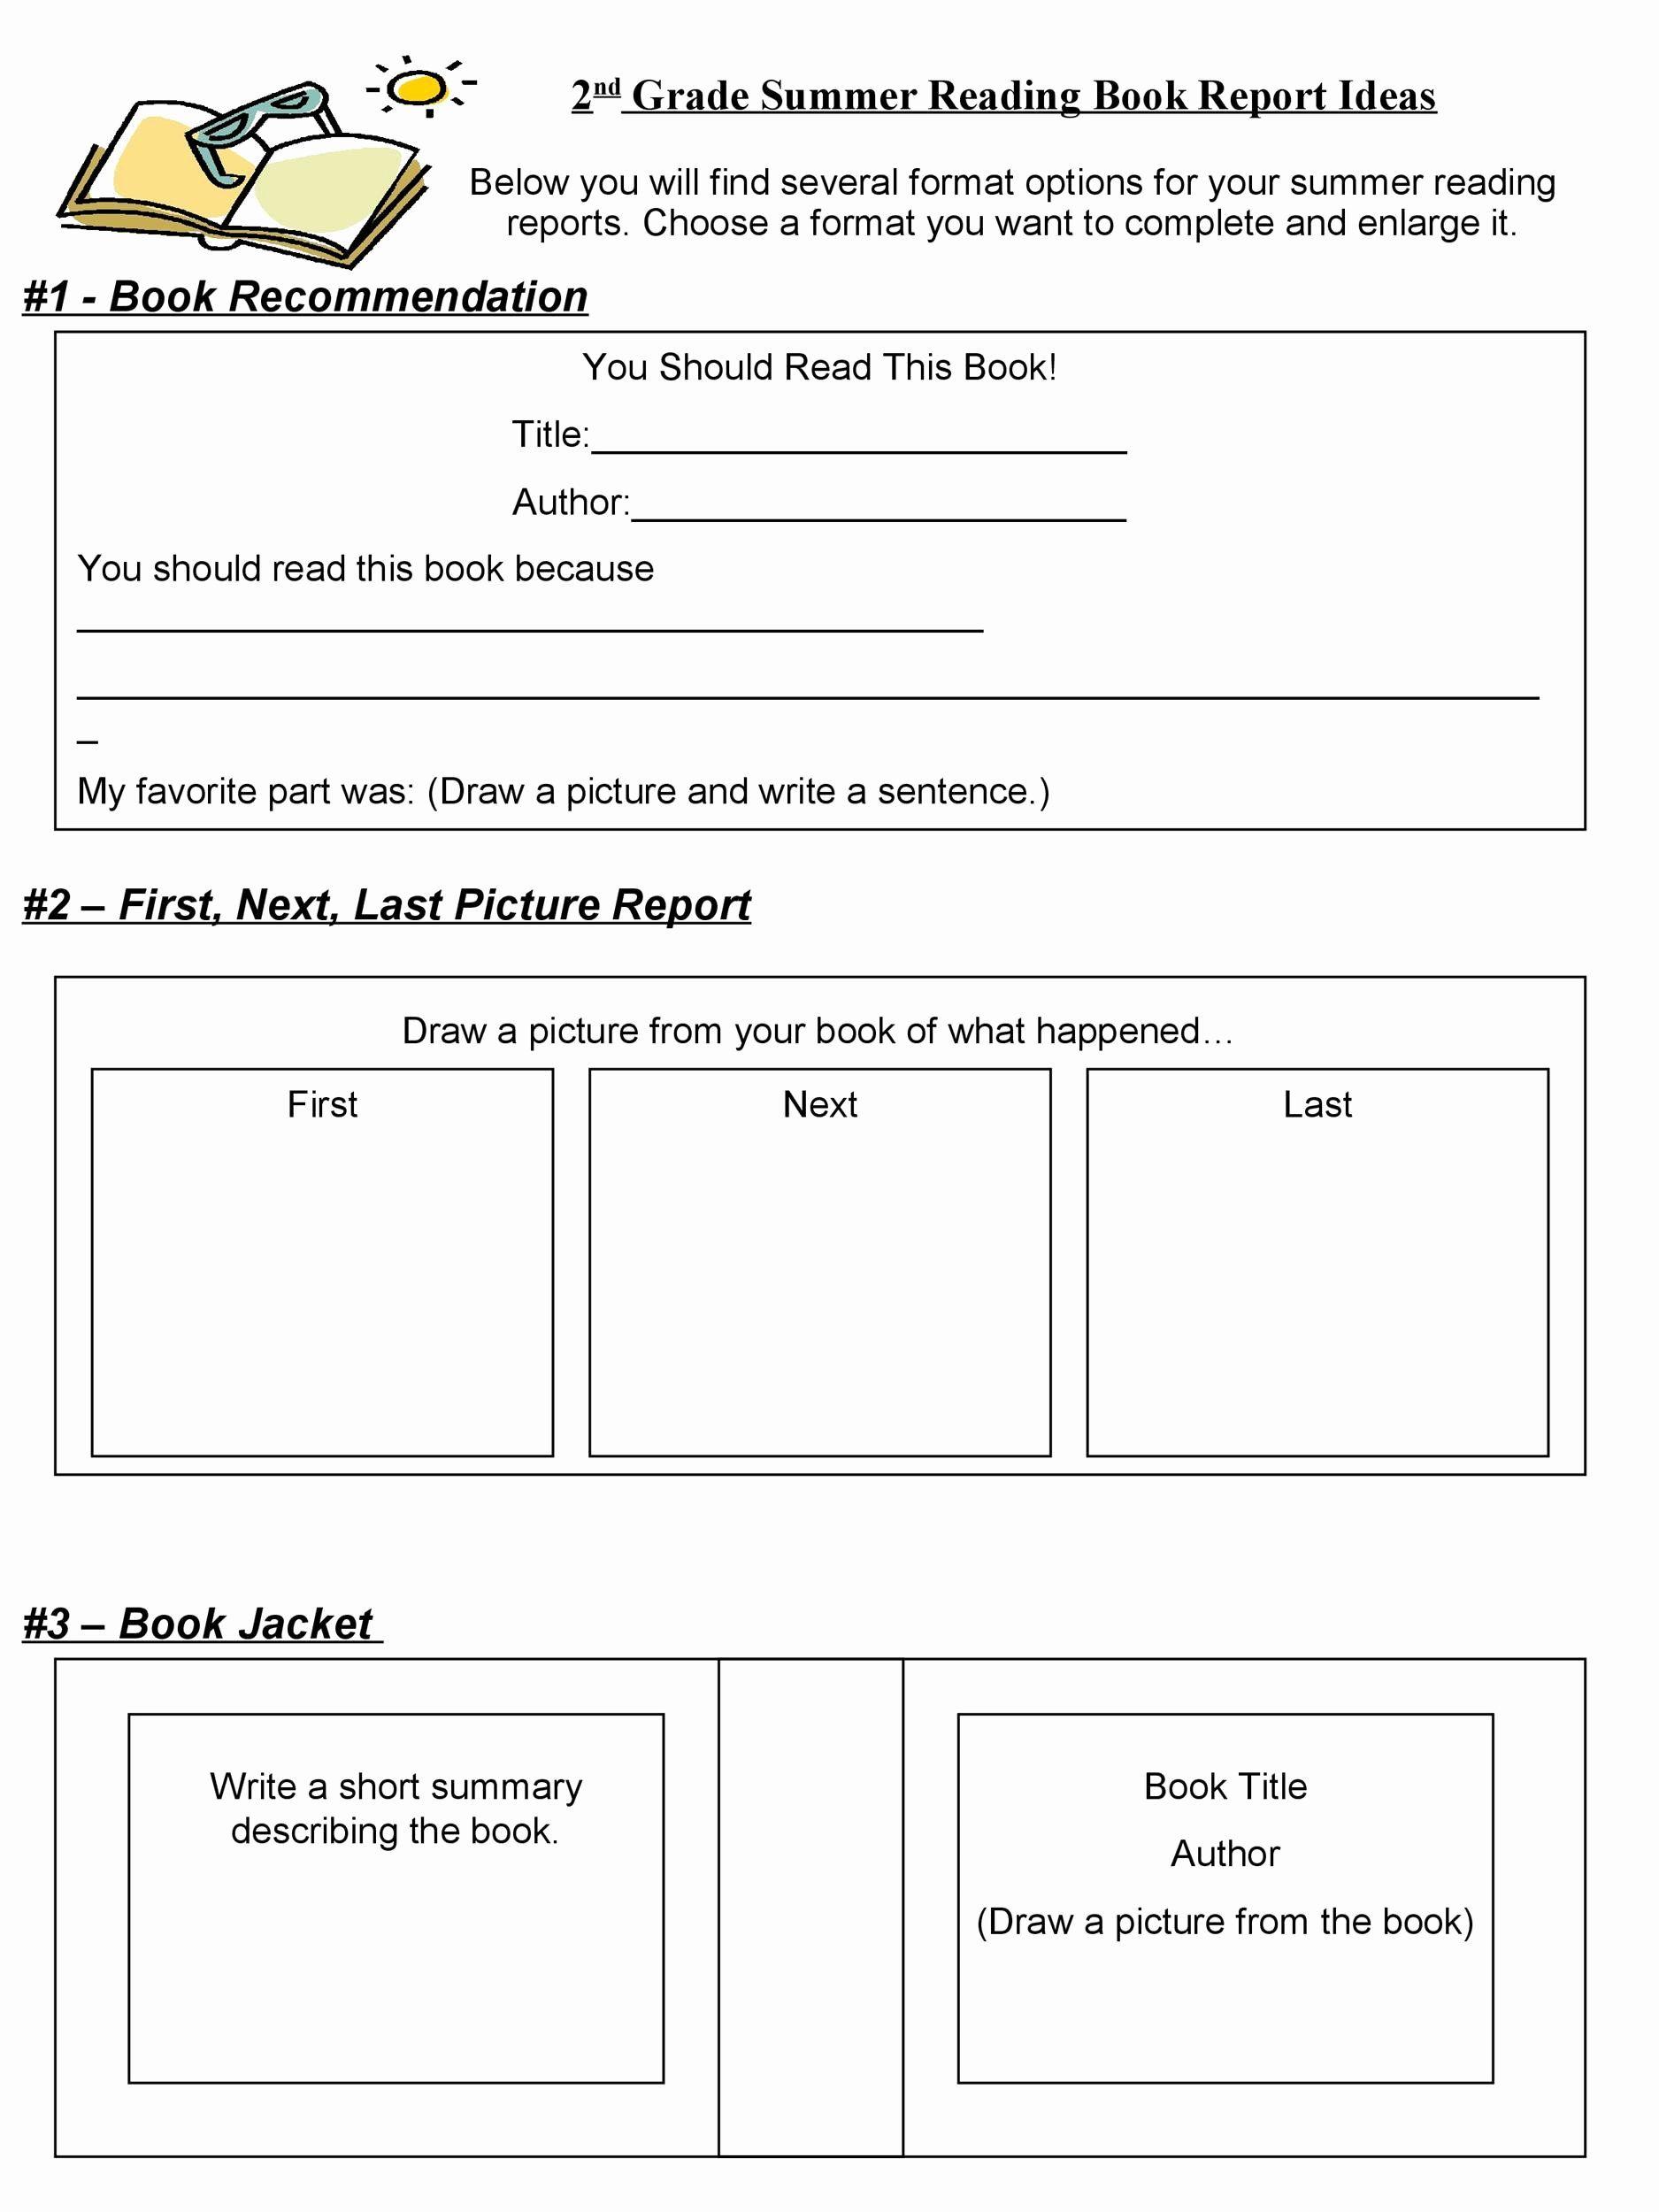 Story Elements Worksheet 3rd Grade Inspirational 20 Story Elements Worksheets 3rd Grade Grade Book Template Book Report Templates Book Report [ 2500 x 1875 Pixel ]